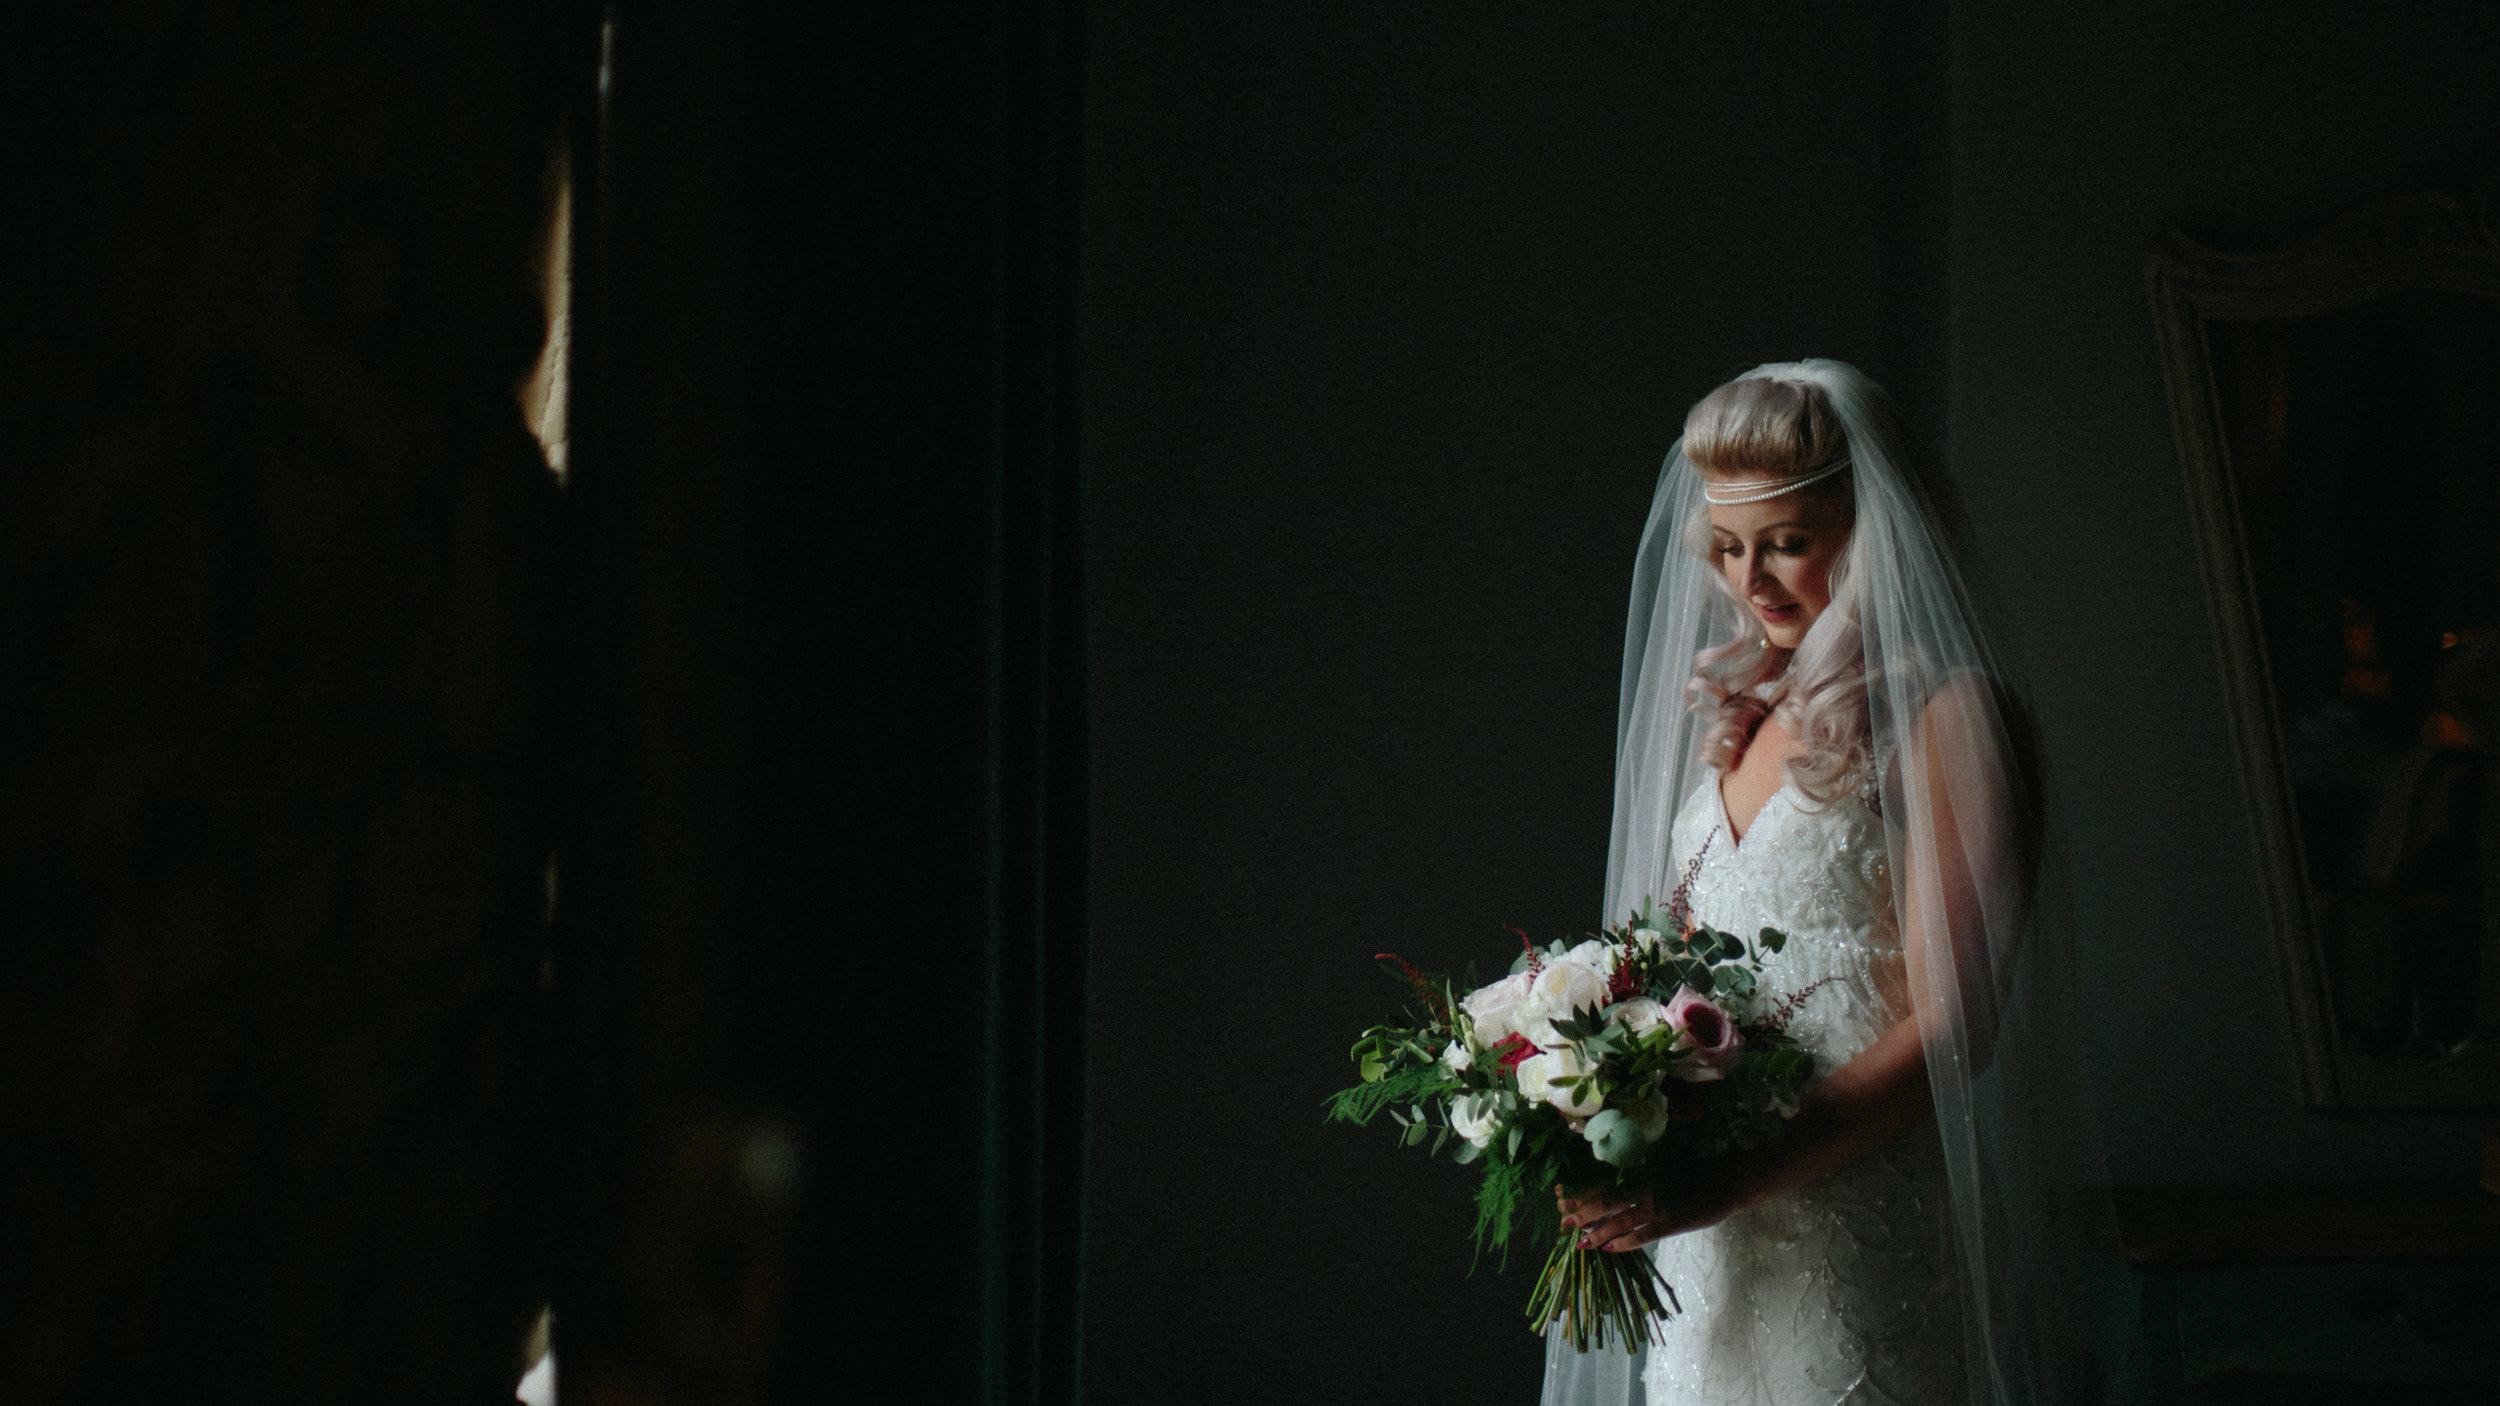 wedding+film,+wedding+video,+wedding+videographer+london,+wedding+film+london,+richmond+wedding+videographer,+richmond+wedding+film,+destination+wedding+film,+destination+wedding+videographer,+london+wedding+videographer,+northeast+wedding+ci